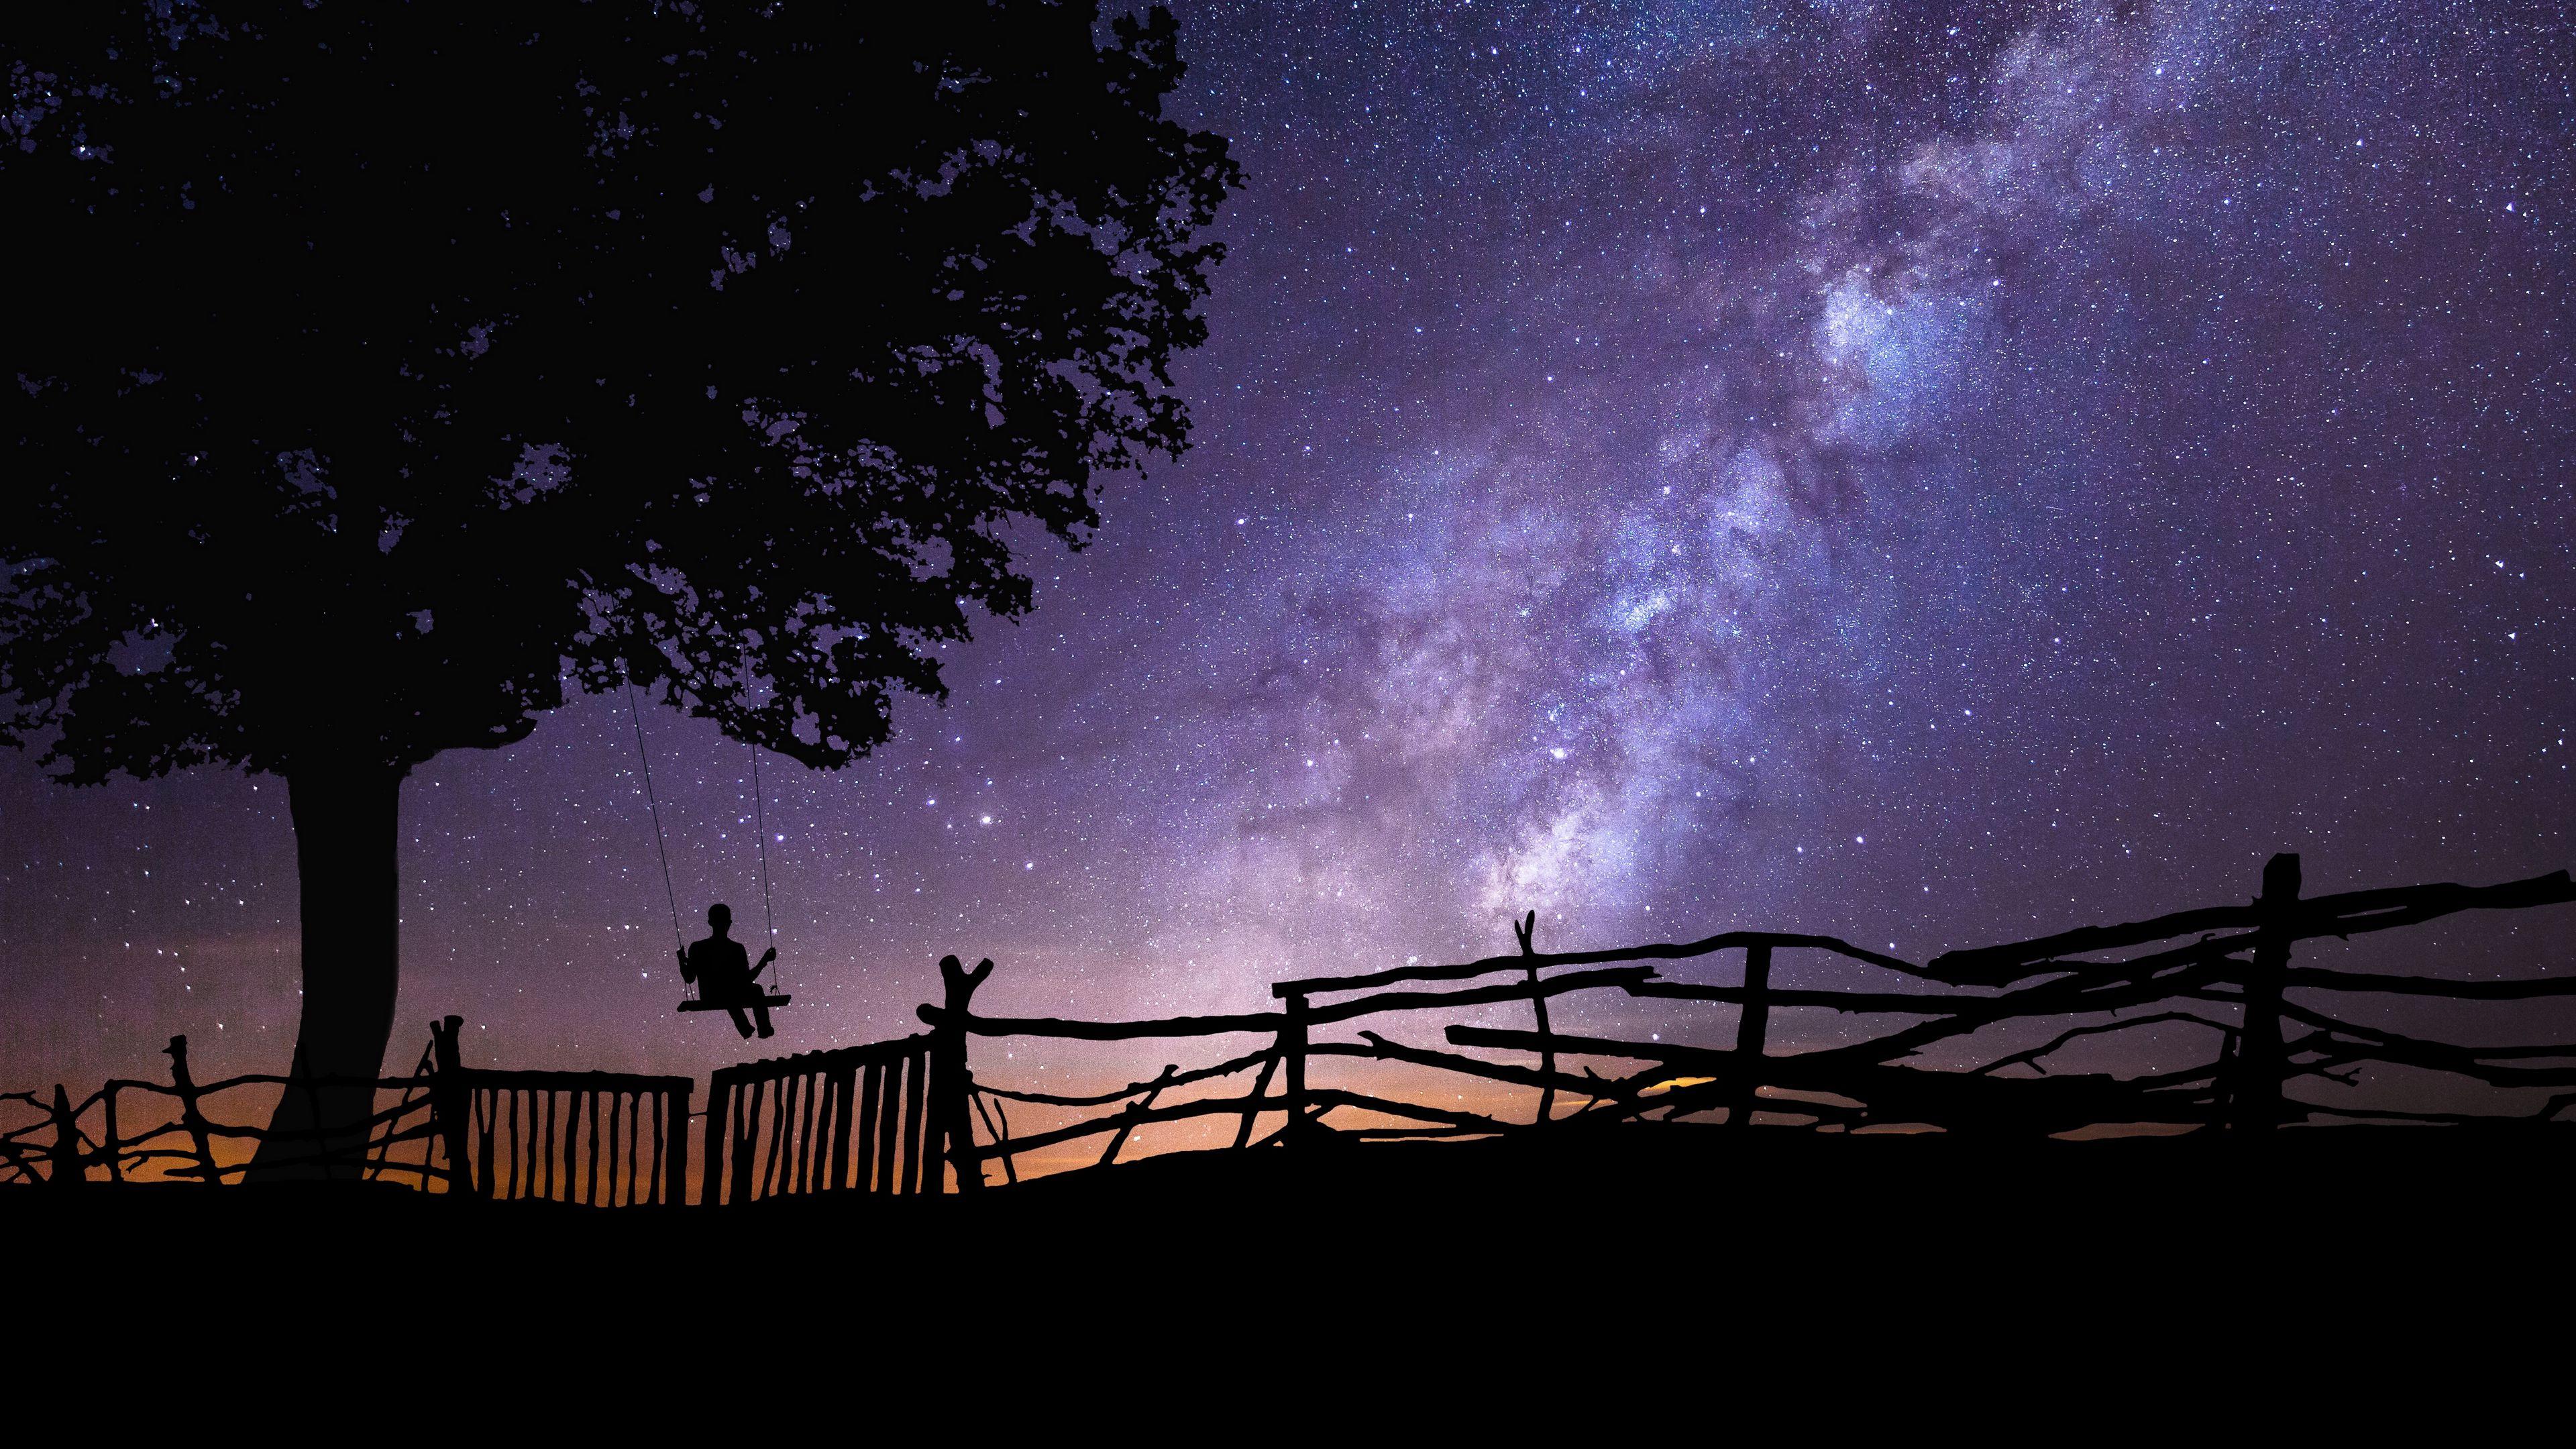 Wallpaper Starry Sky, Silhouette, Swing, Tree, Night - Beautiful Country Night , HD Wallpaper & Backgrounds